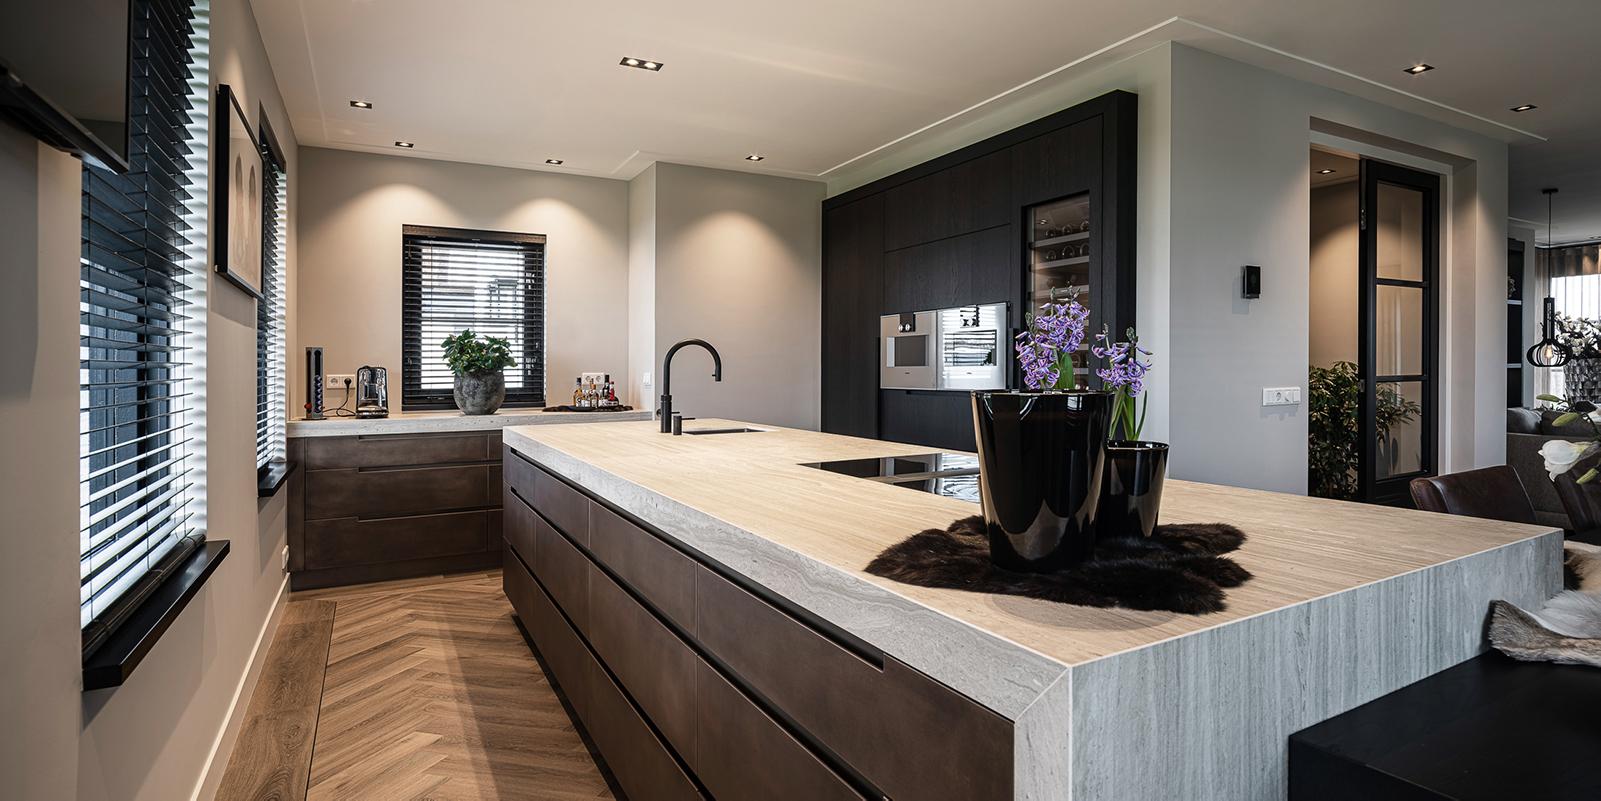 Moderne keuken. van essen keukens. the art of living